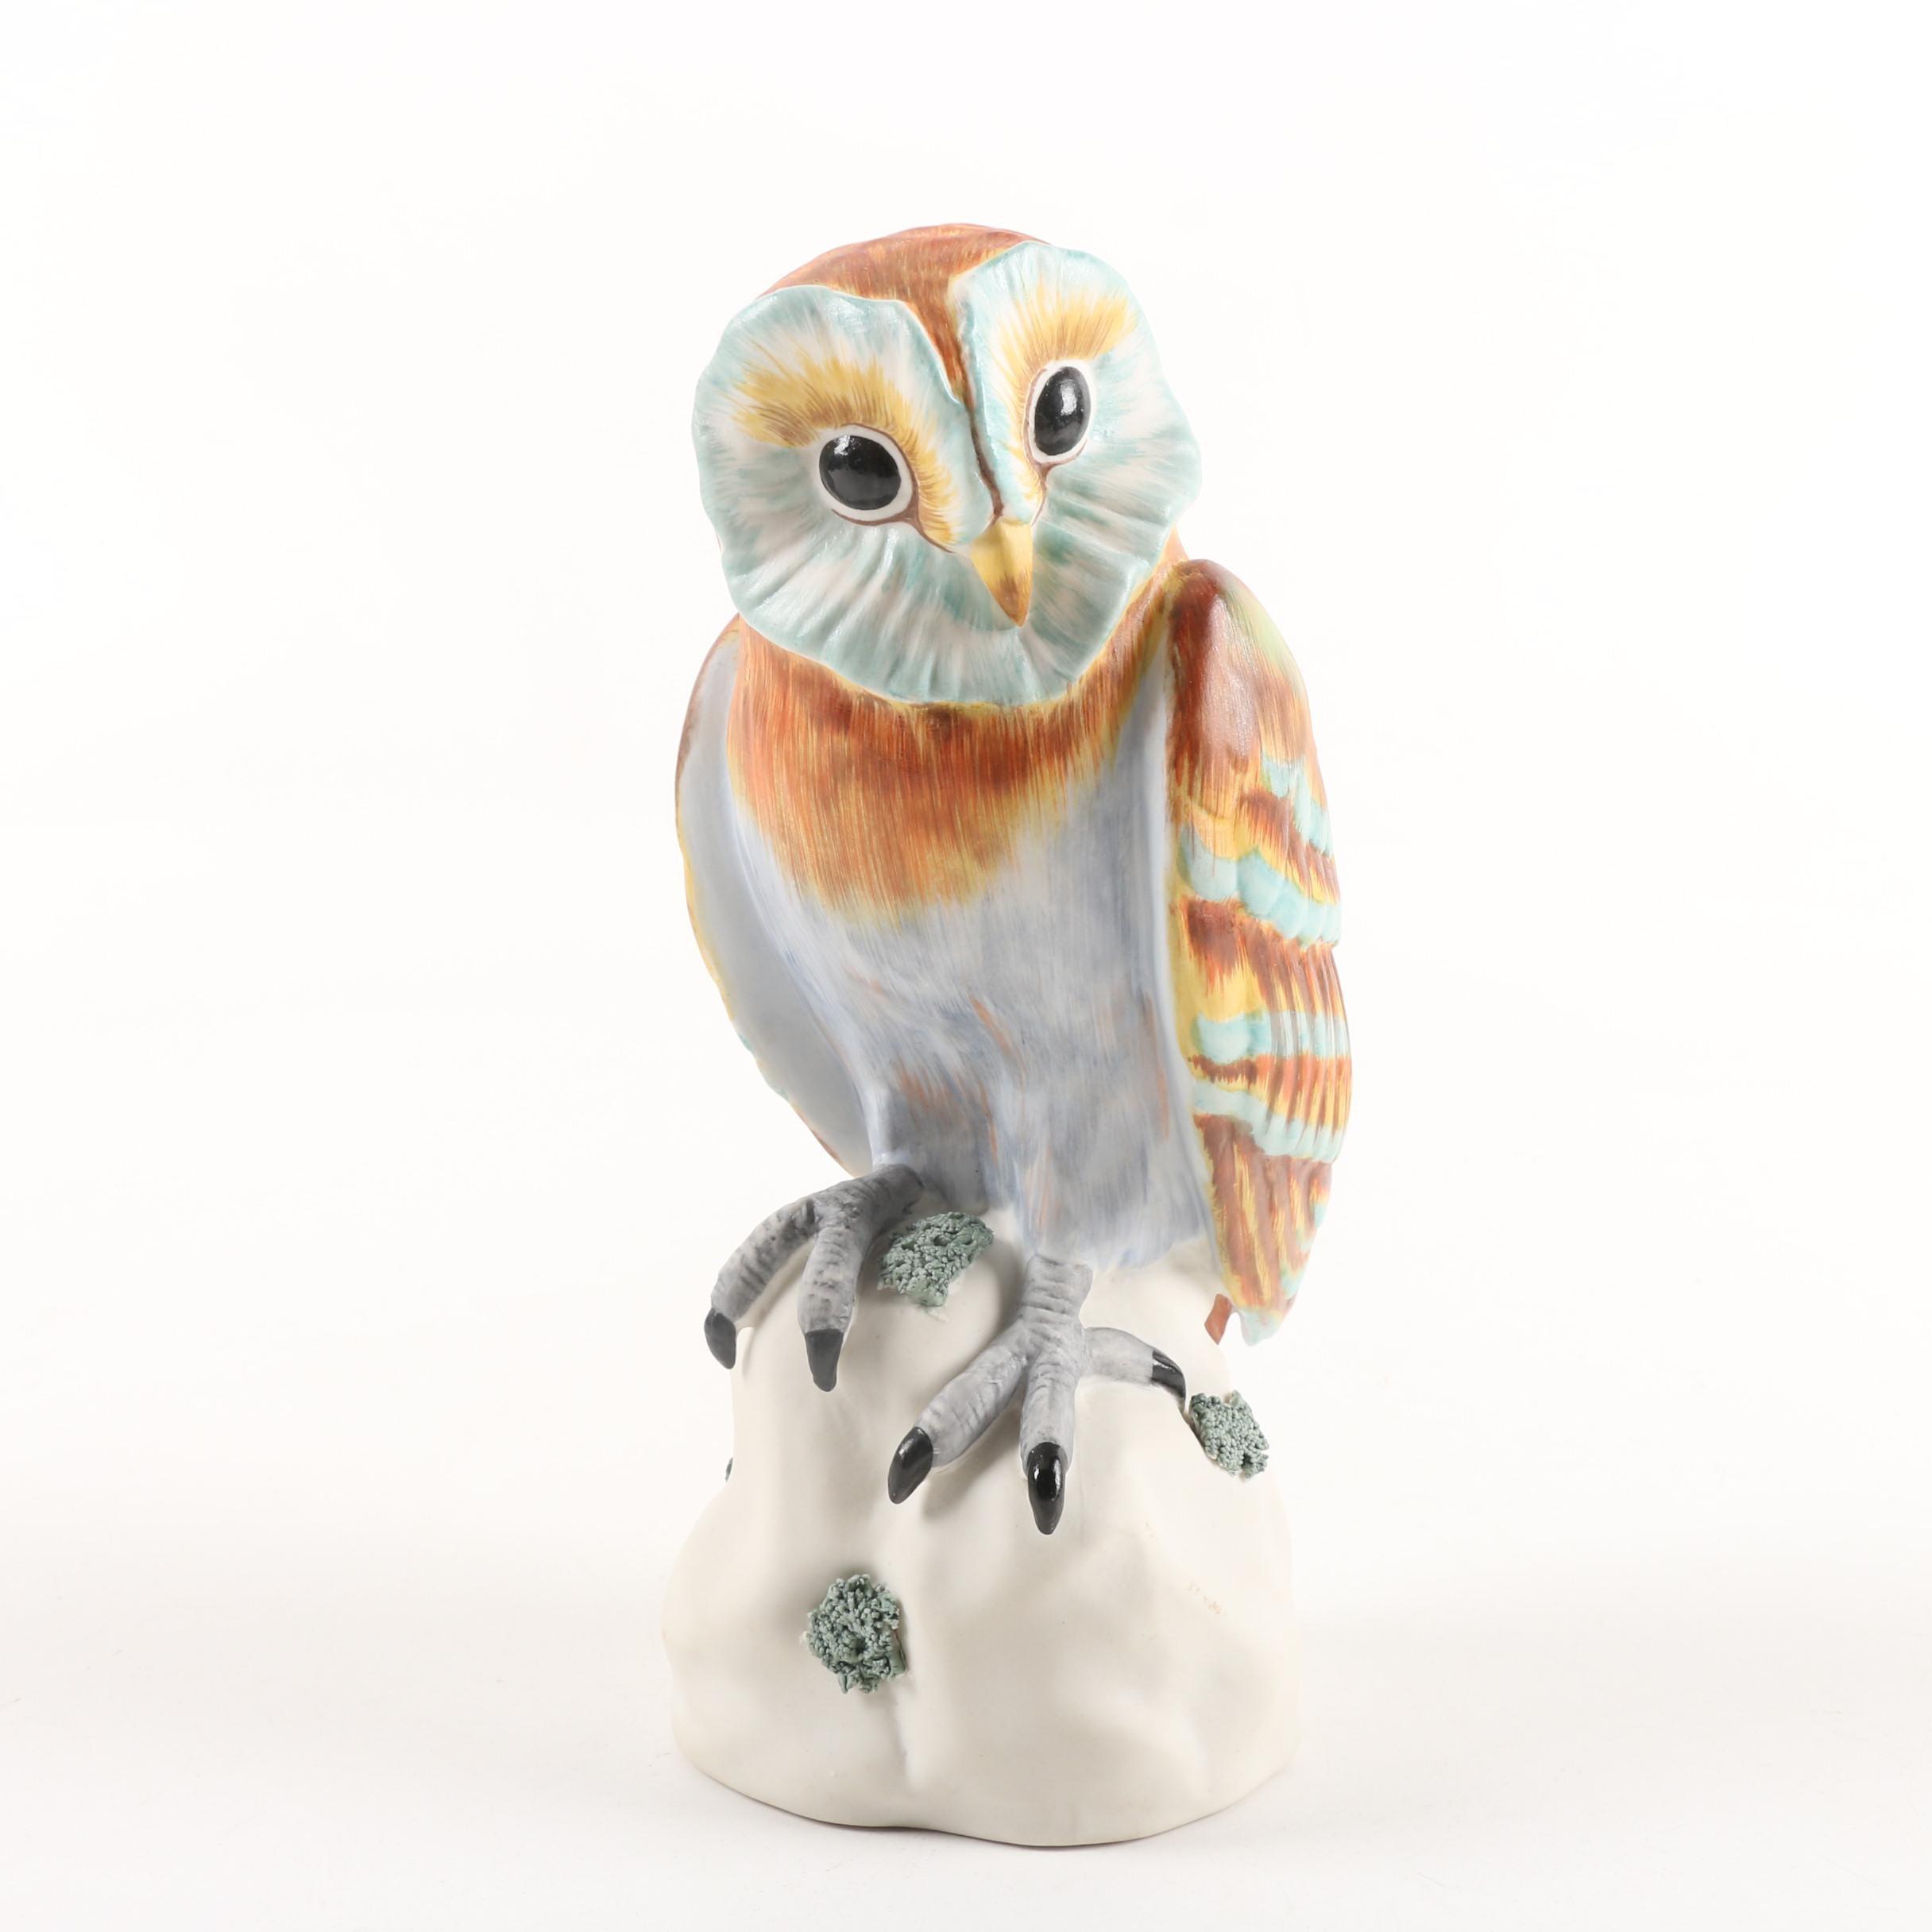 Italian Hand-Painted Porcelain Owl Figurine